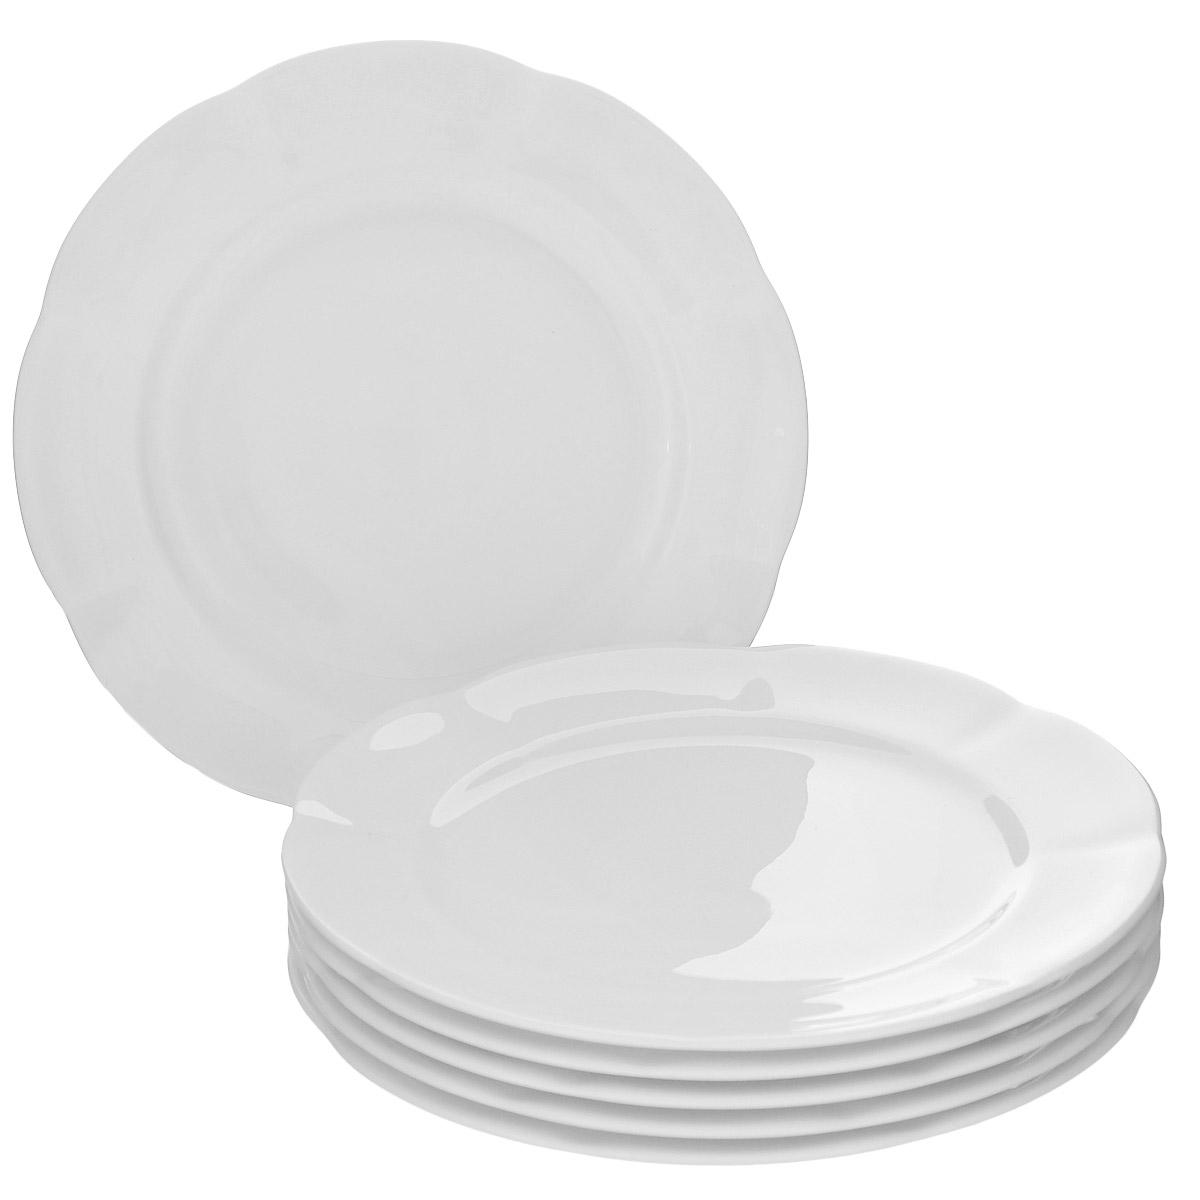 "Набор десертных тарелок Royal Bone China ""White"", диаметр 16 см, 6 шт"